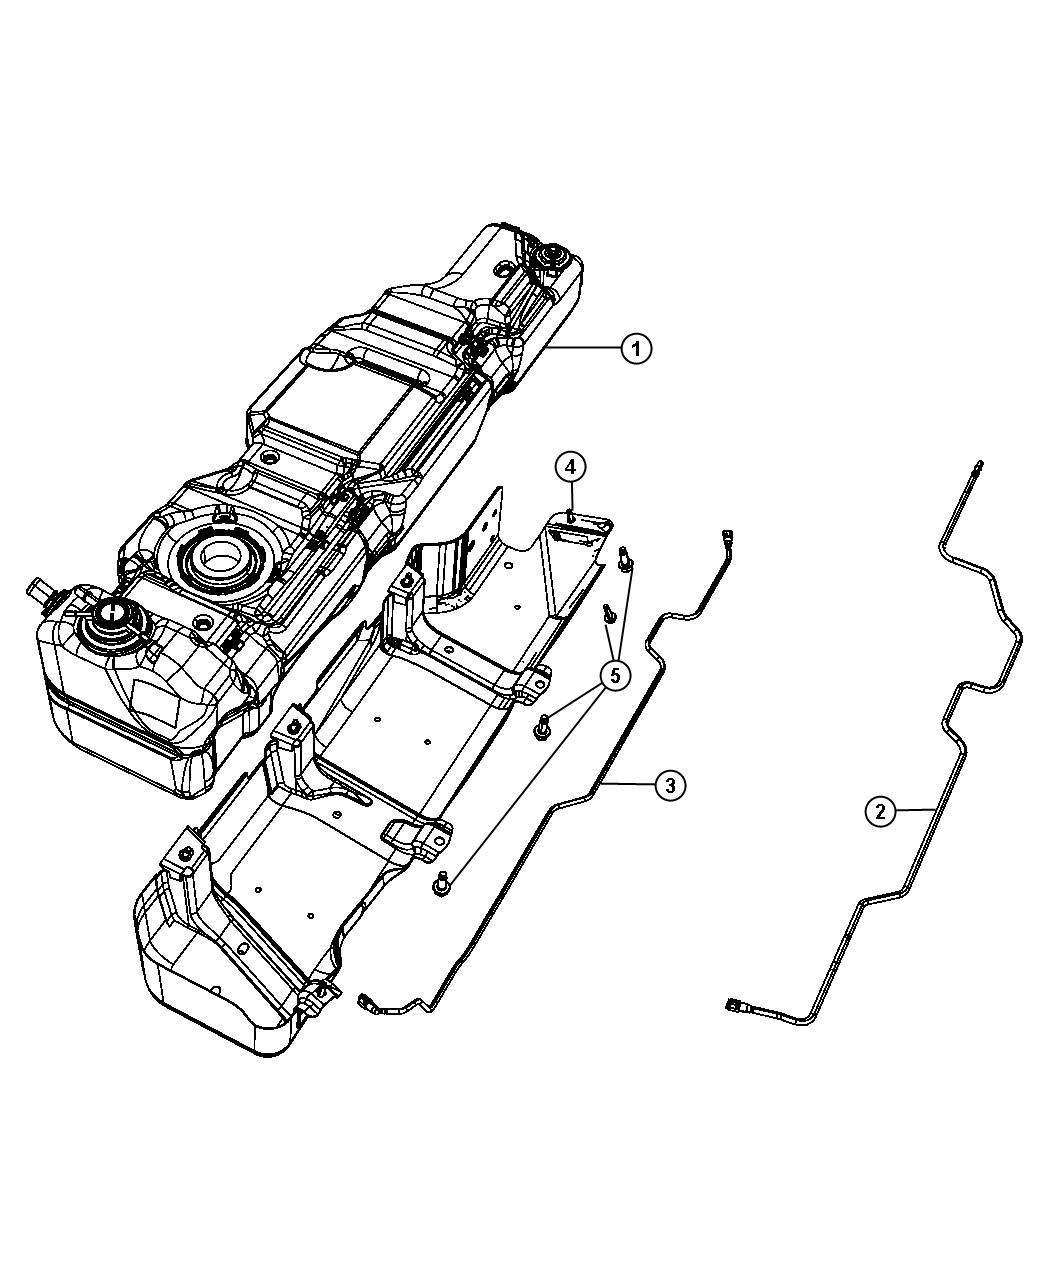 Jeep Wrangler Unlimited X 3 8l V6 M T 4x4 Skid Plate